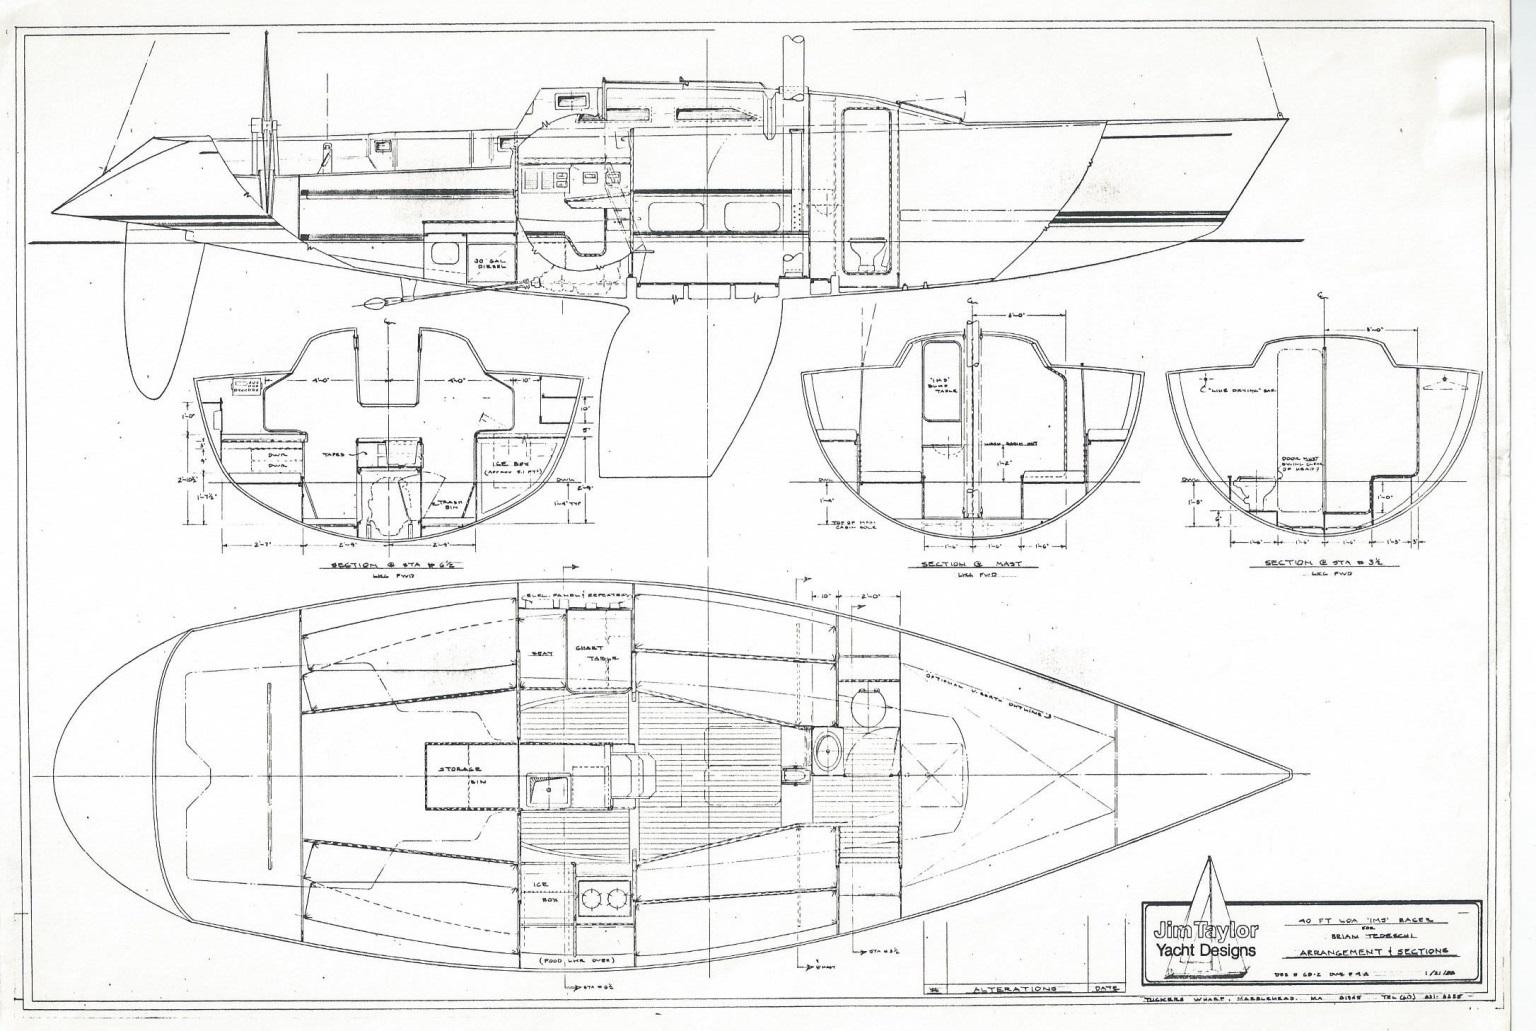 C:\Users\Jim Taylor\Desktop\JTYD\JT_Promo\WebSite\2013\Designs\Racing\68_T40's\T40_Layout.jpeg.jpeg